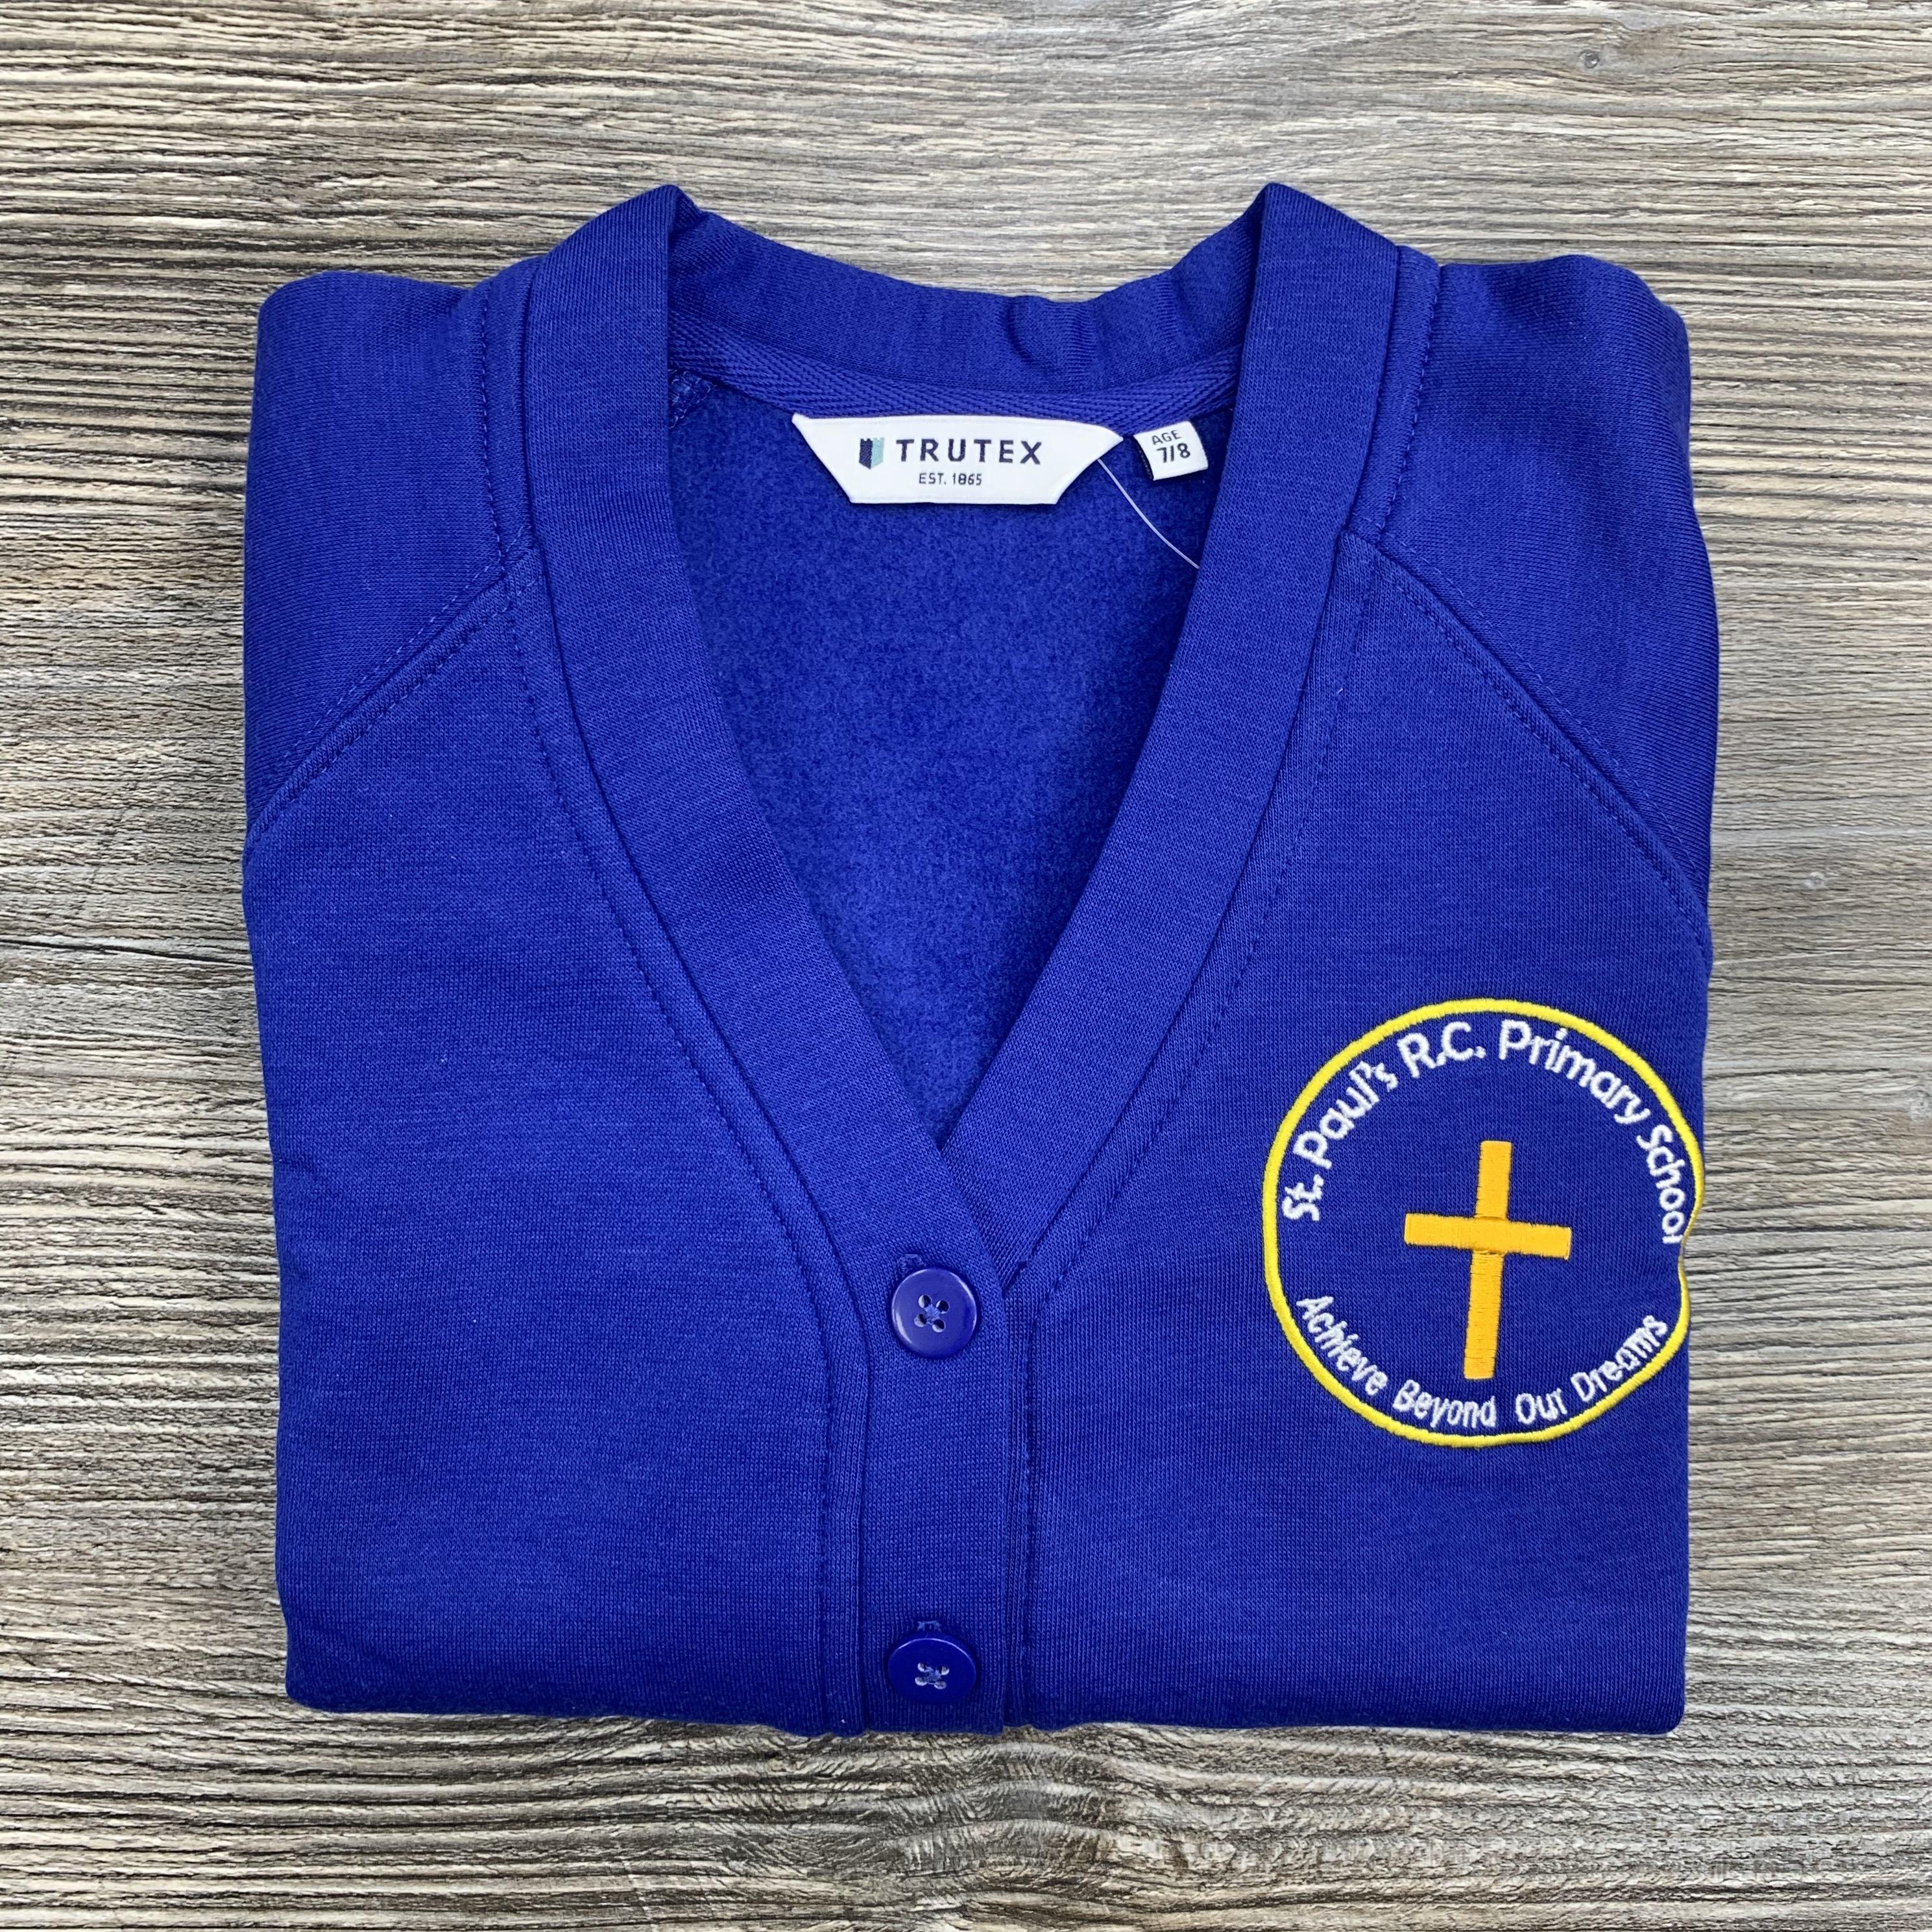 St Pauls Feniscowles Sweat Cardigan